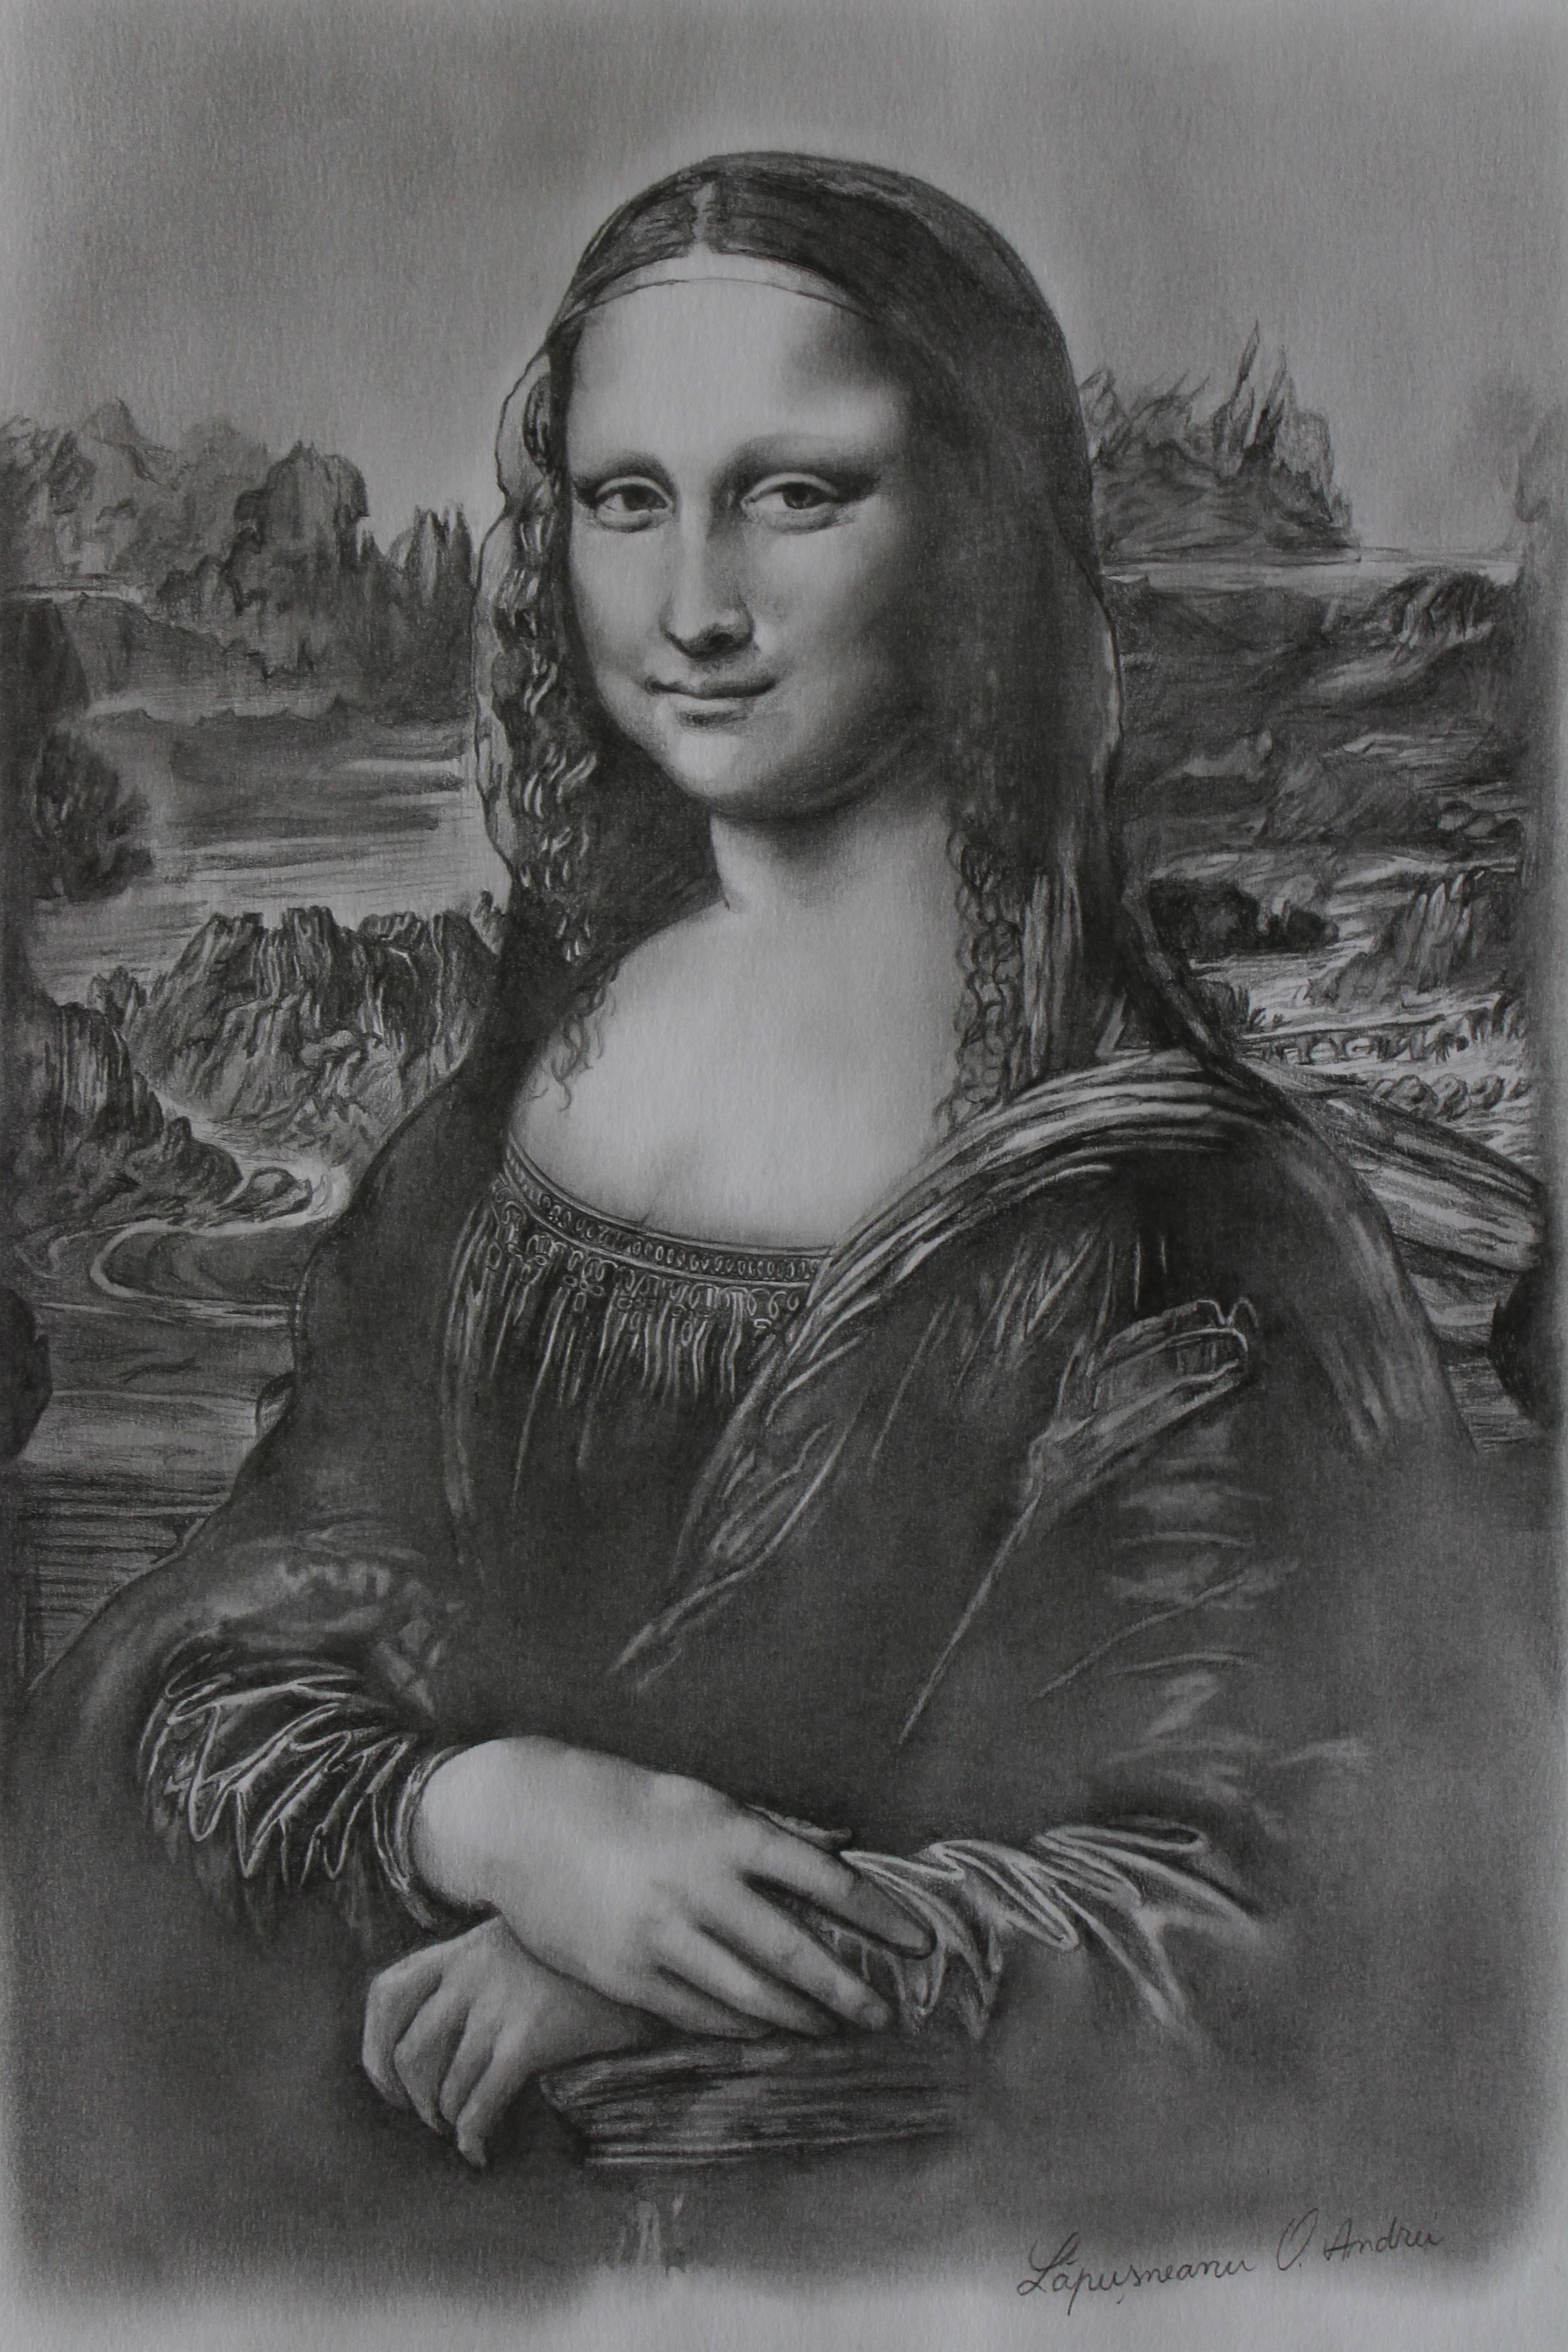 Drawn portrait mona lisa Lisa Lisa by DeviantArt by